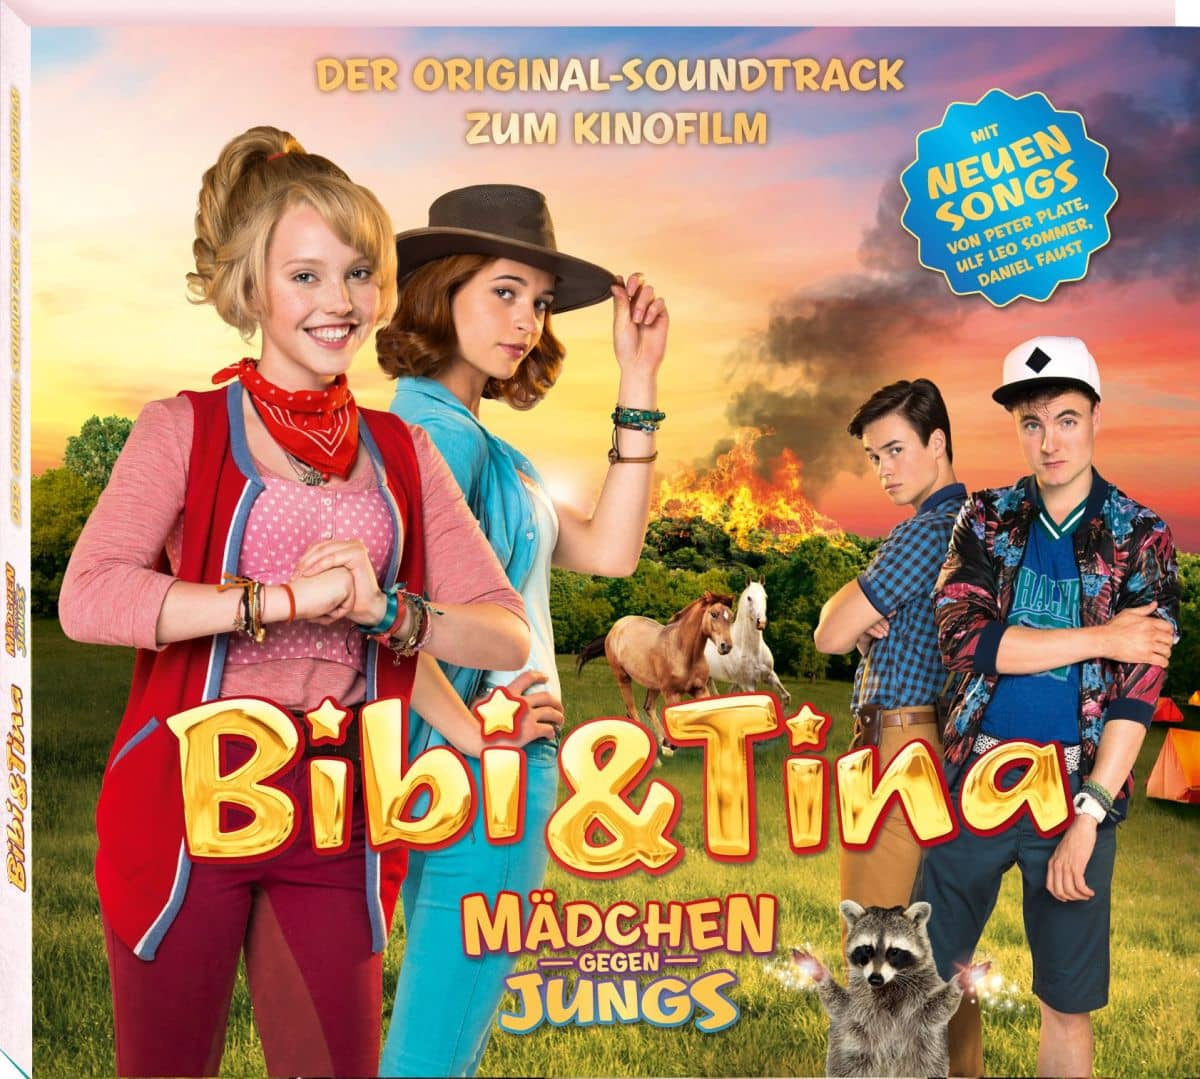 cd bibi und tina - original soundtrack zum film - mädchen